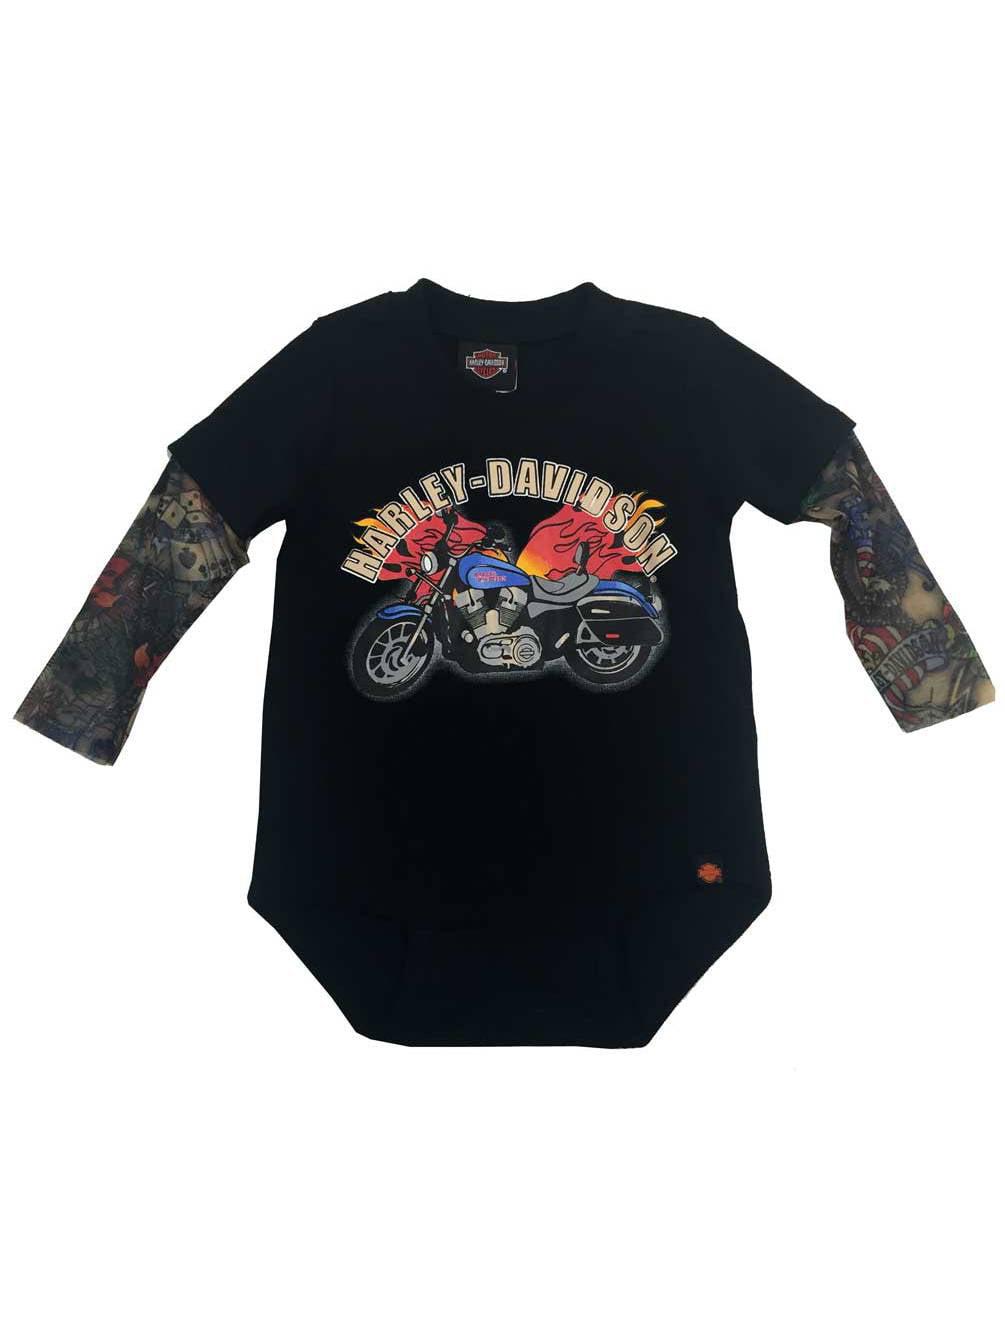 32dab5967 Harley-Davidson - Harley-Davidson Baby Boys' Motorcycle Infant Creeper w/  Tattoo Sleeves 3060641, Harley Davidson - Walmart.com